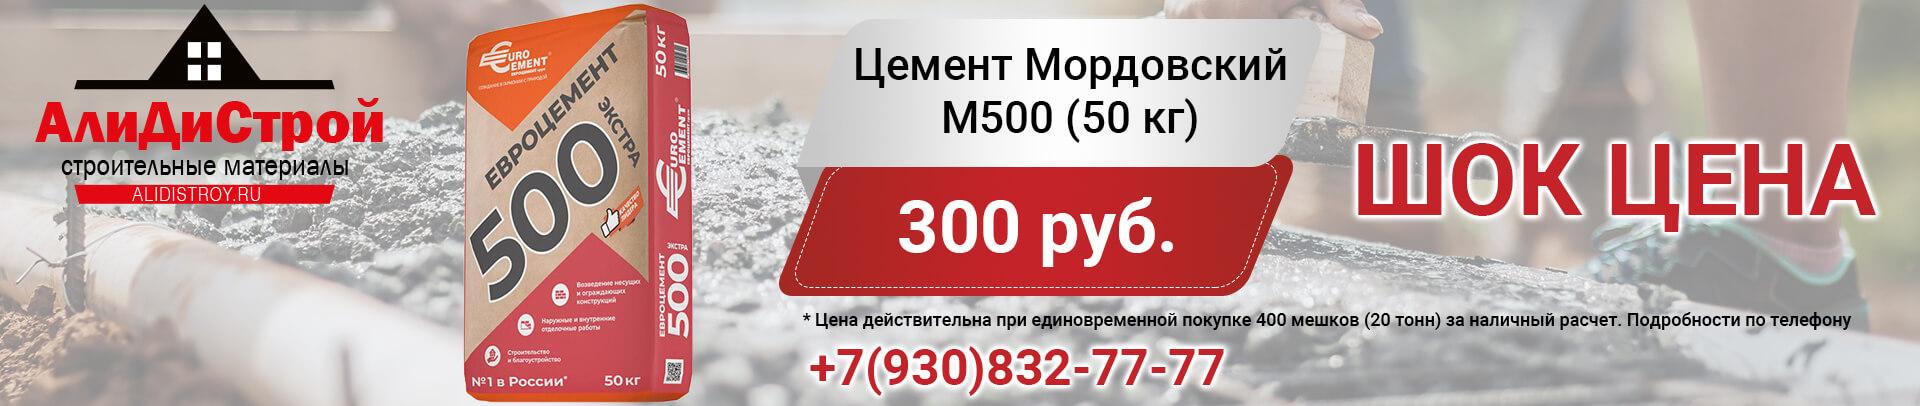 Акция цемент 400 мешков